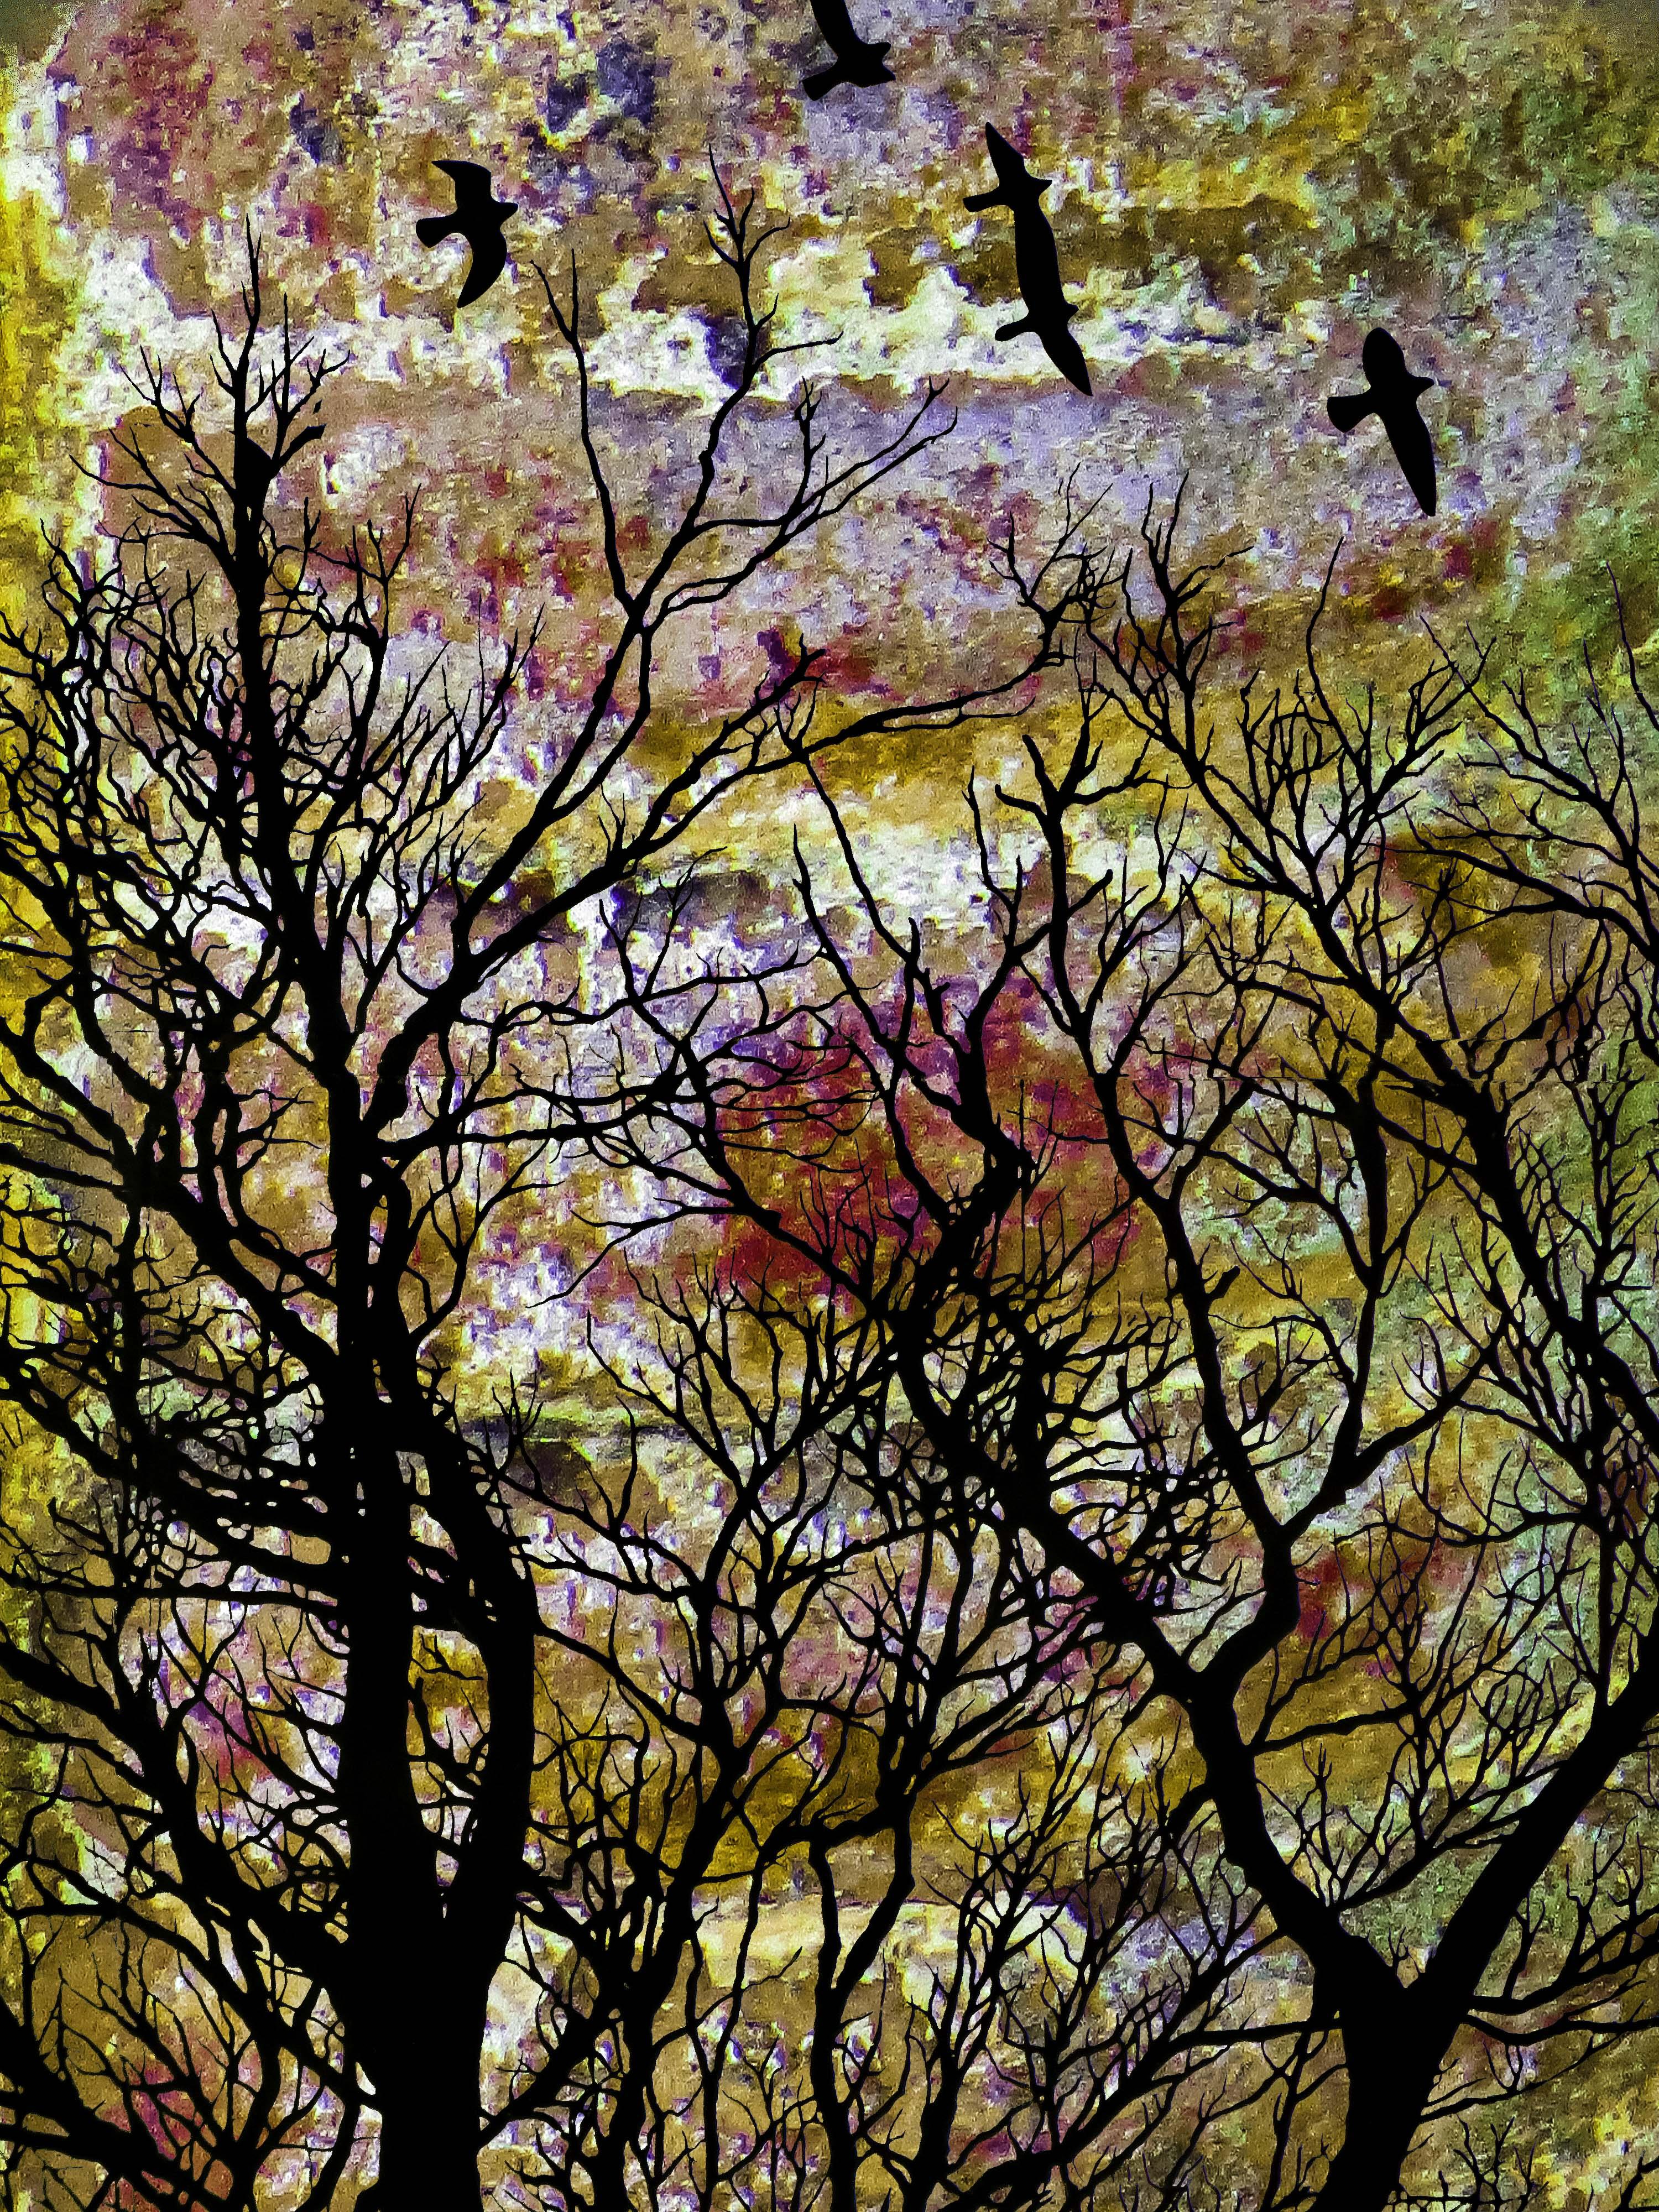 TreeScene FLW 97632 kjytgbcxzyyy.jpg